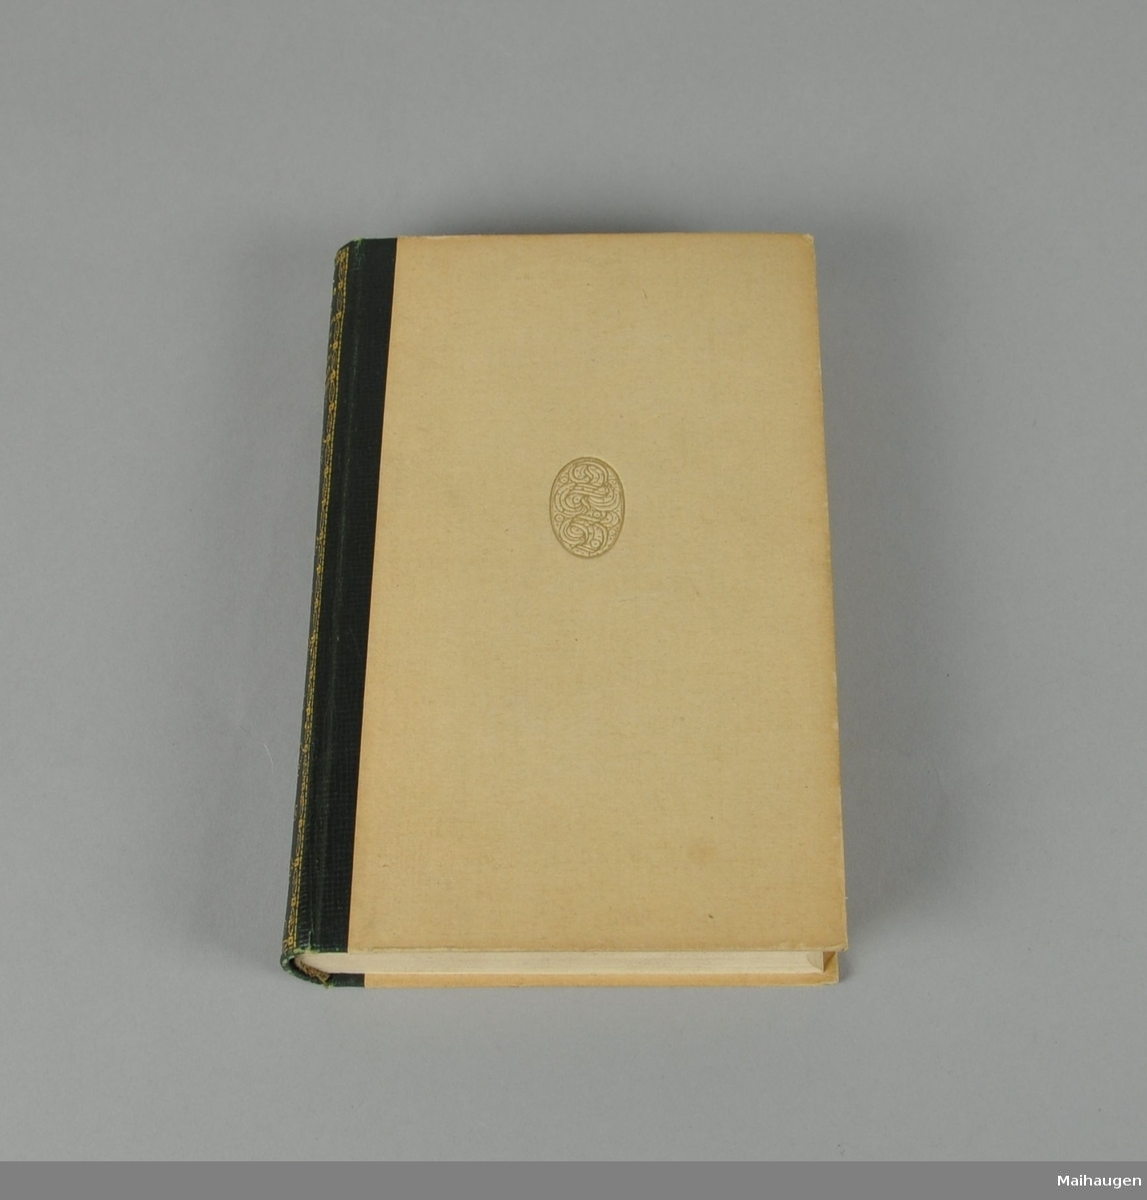 s. 485.